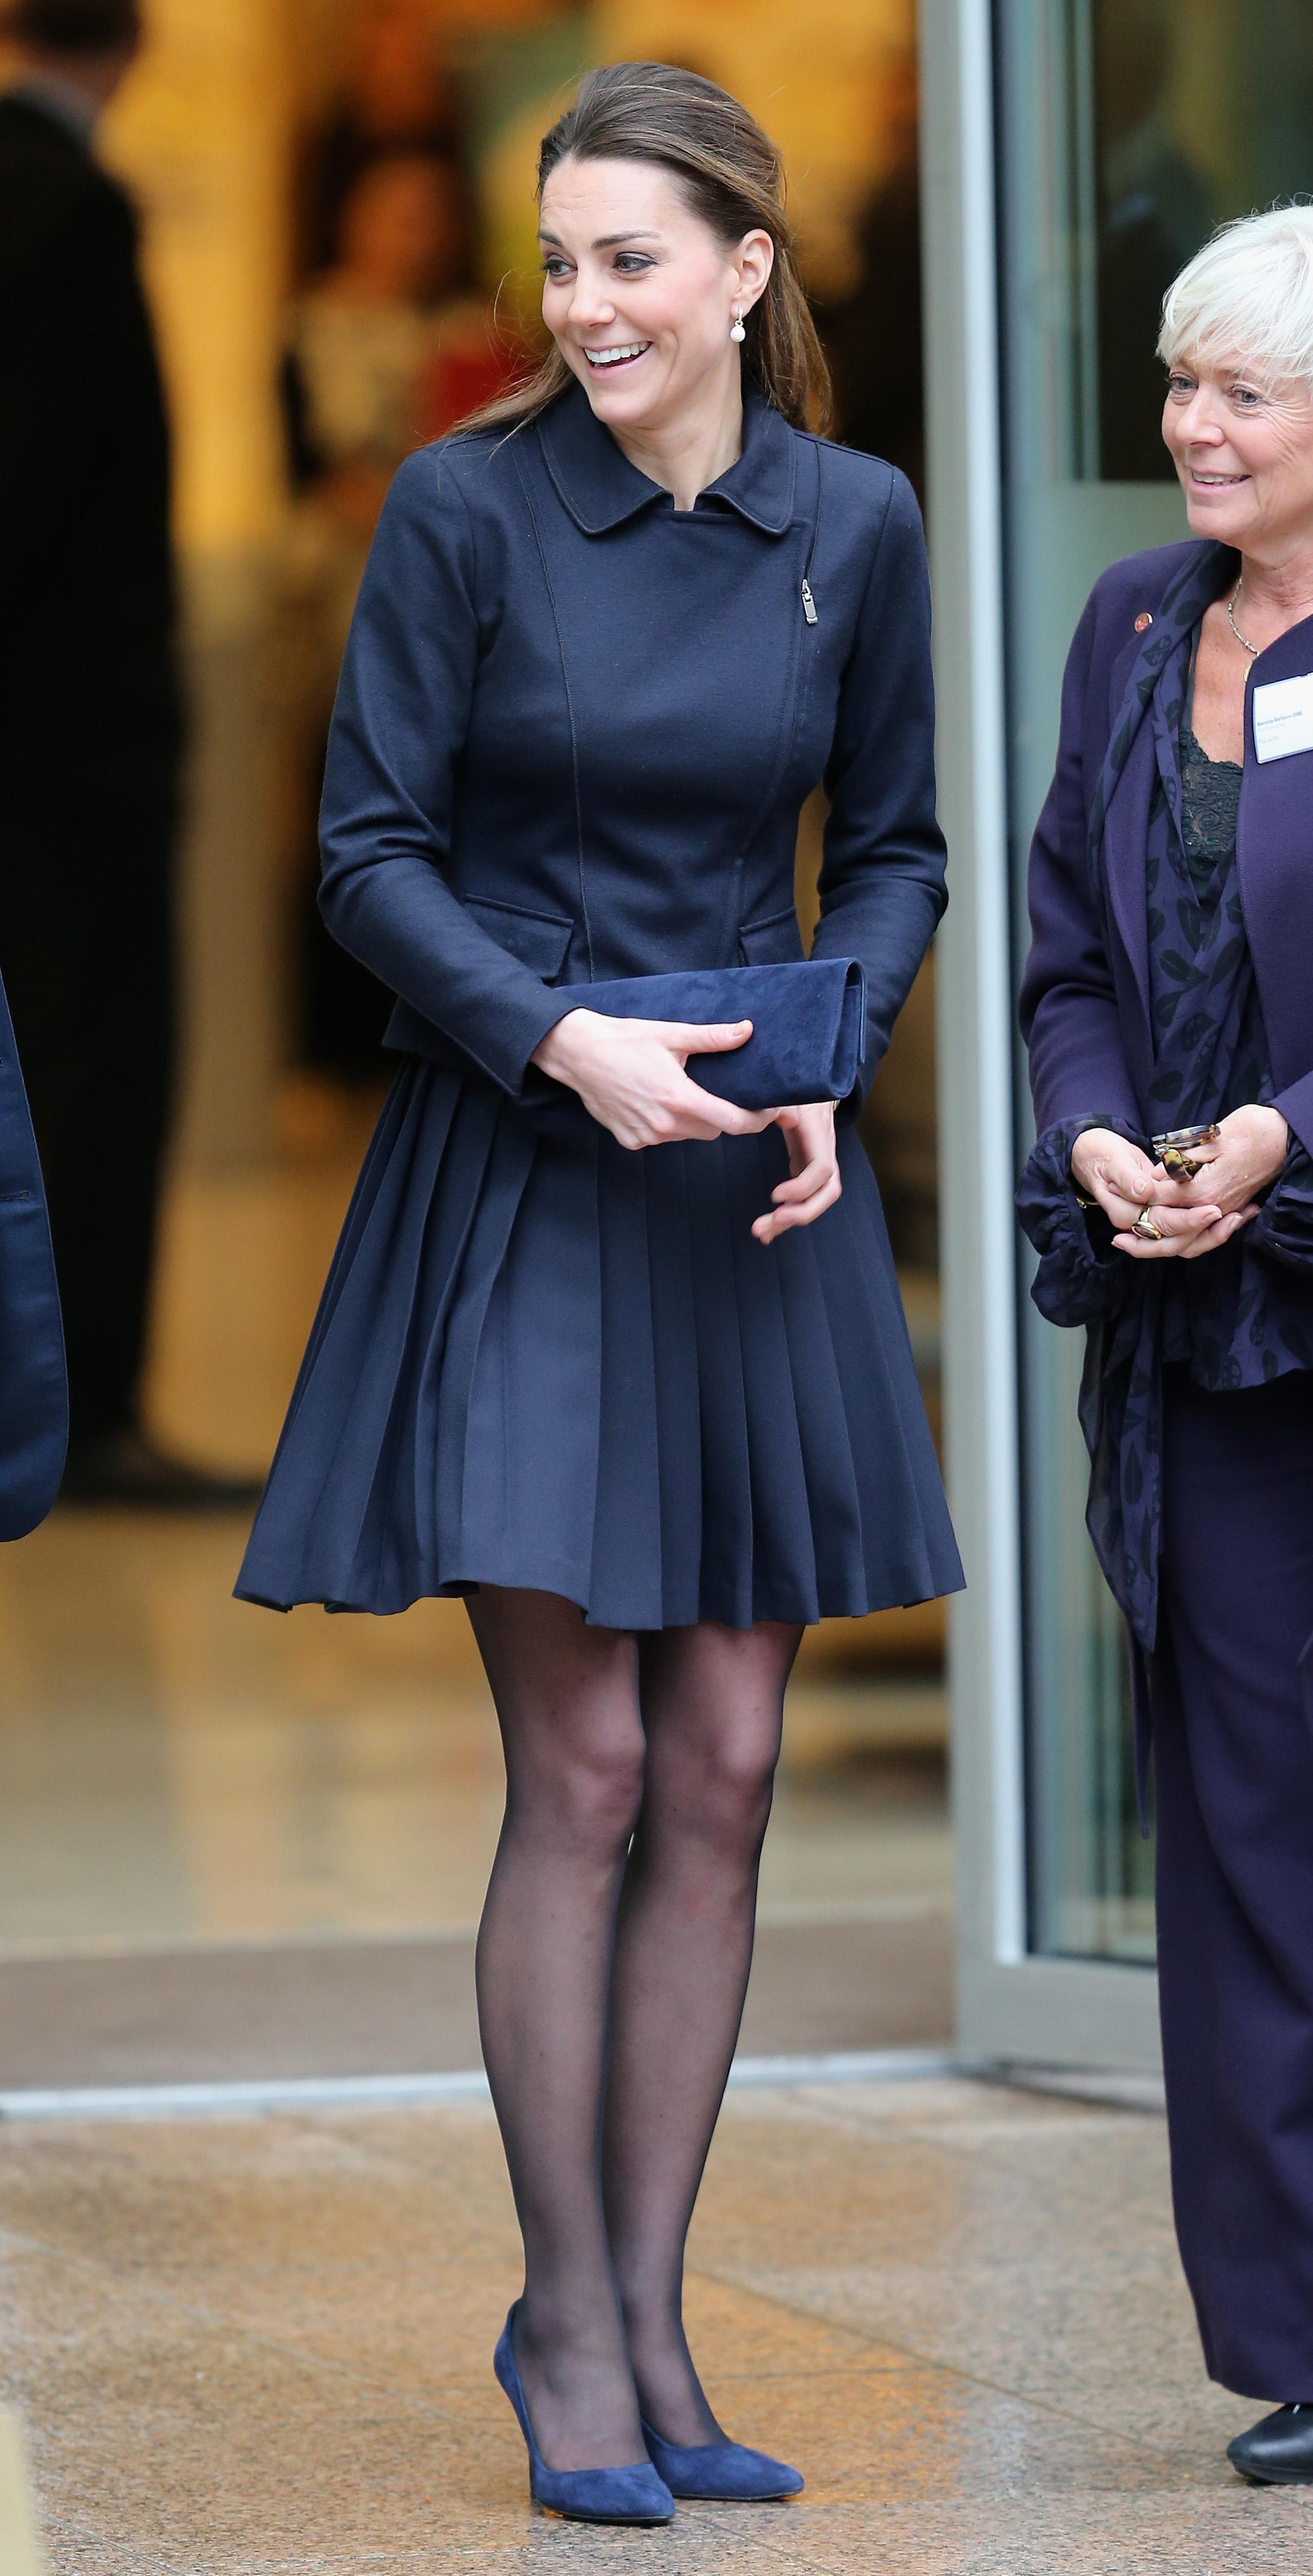 Kate Middleton Wears A Pleated Skirt Has A Marilyn Monroe